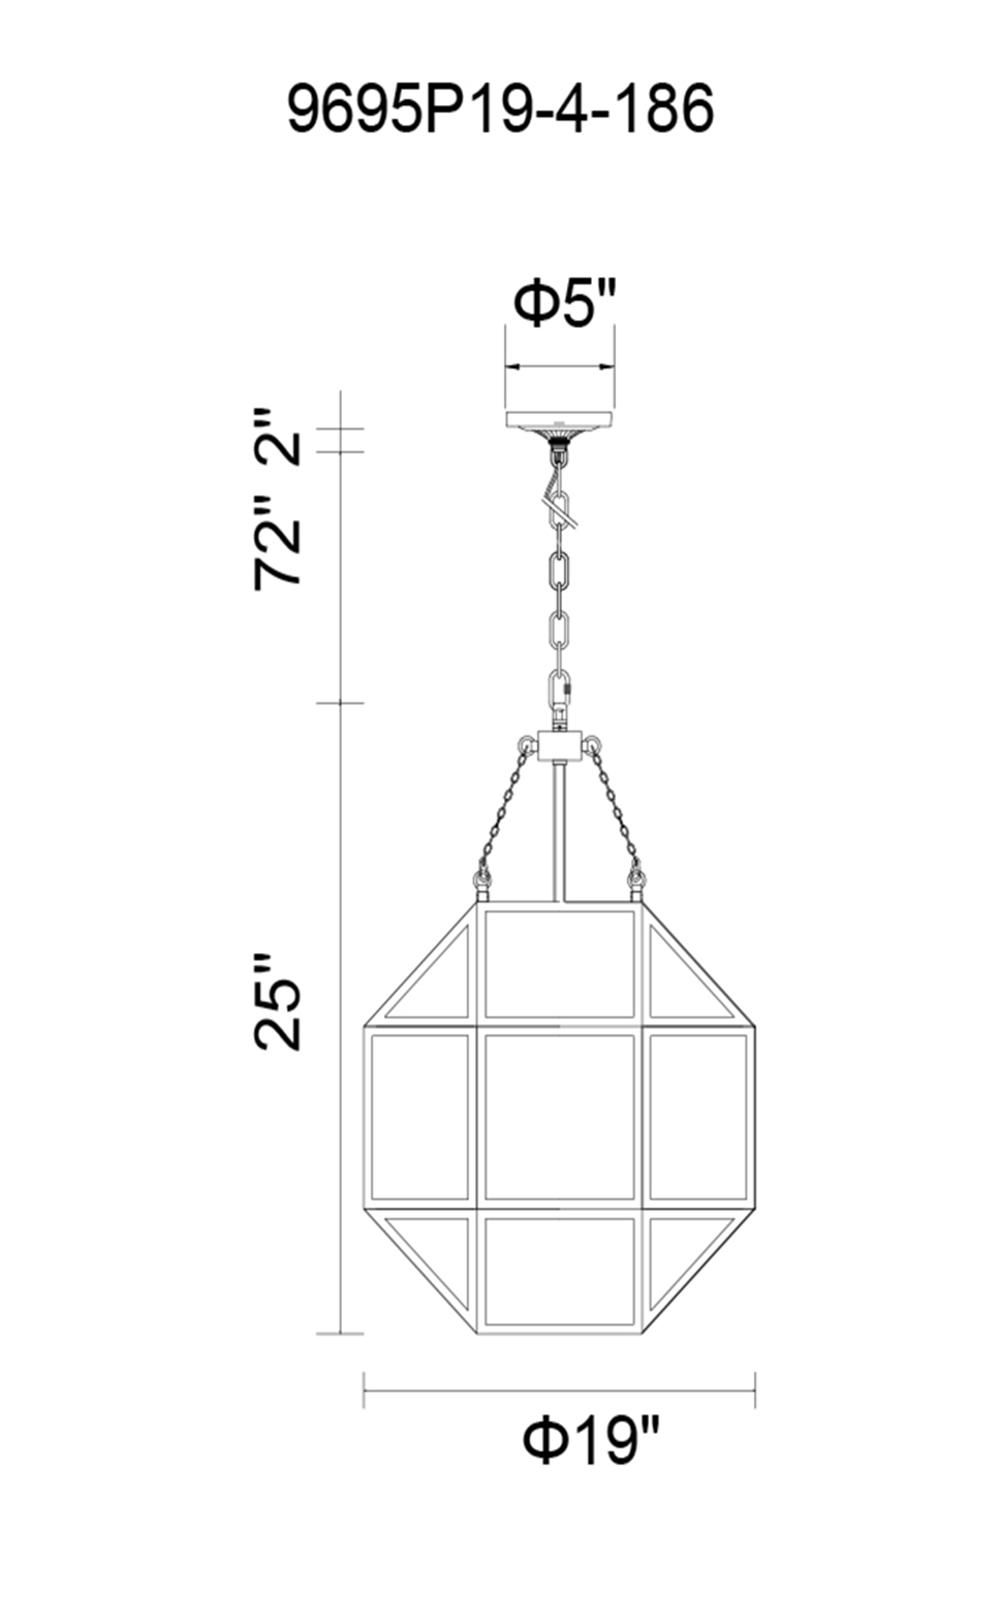 CWI Lighting Dvina 4 Light Pendant With Rust Finish Model: 9695P19-4-186 Line Drawing